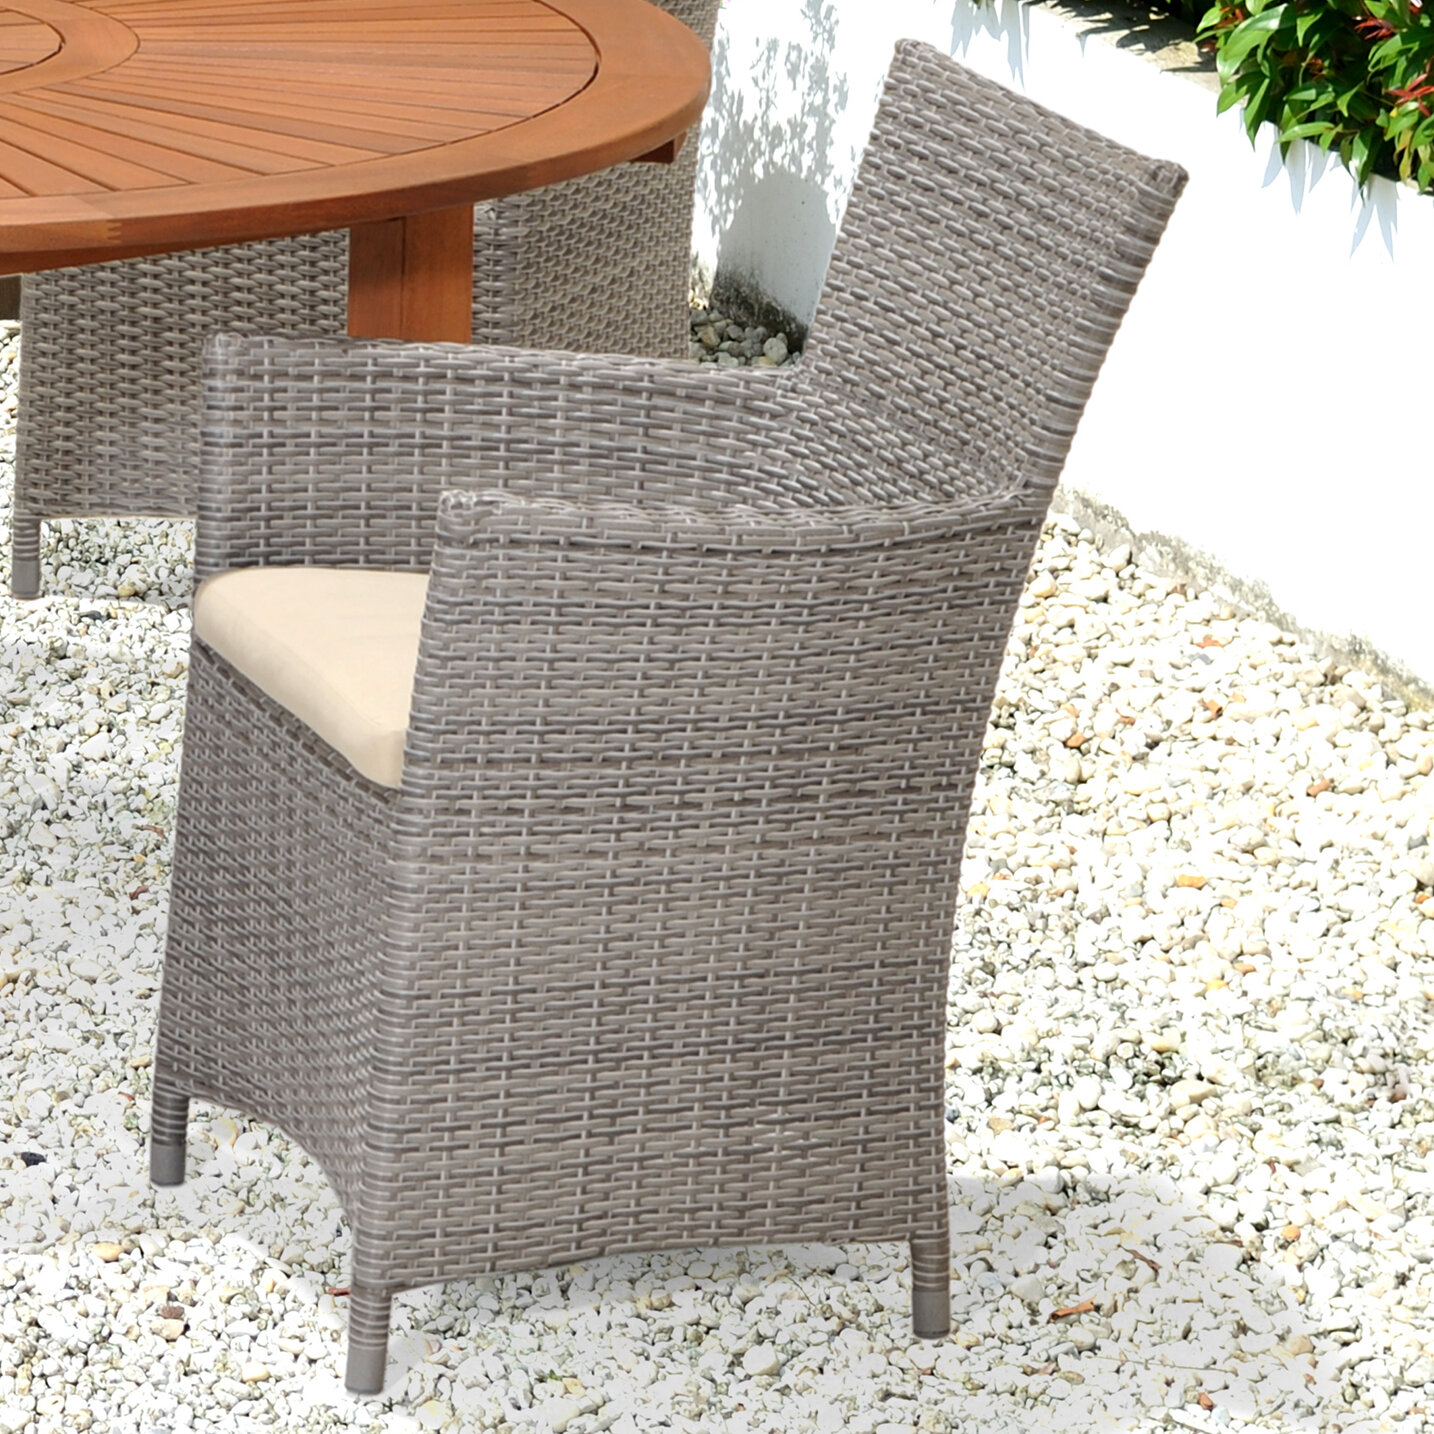 Wildon home baker lounge chair reviews wayfair